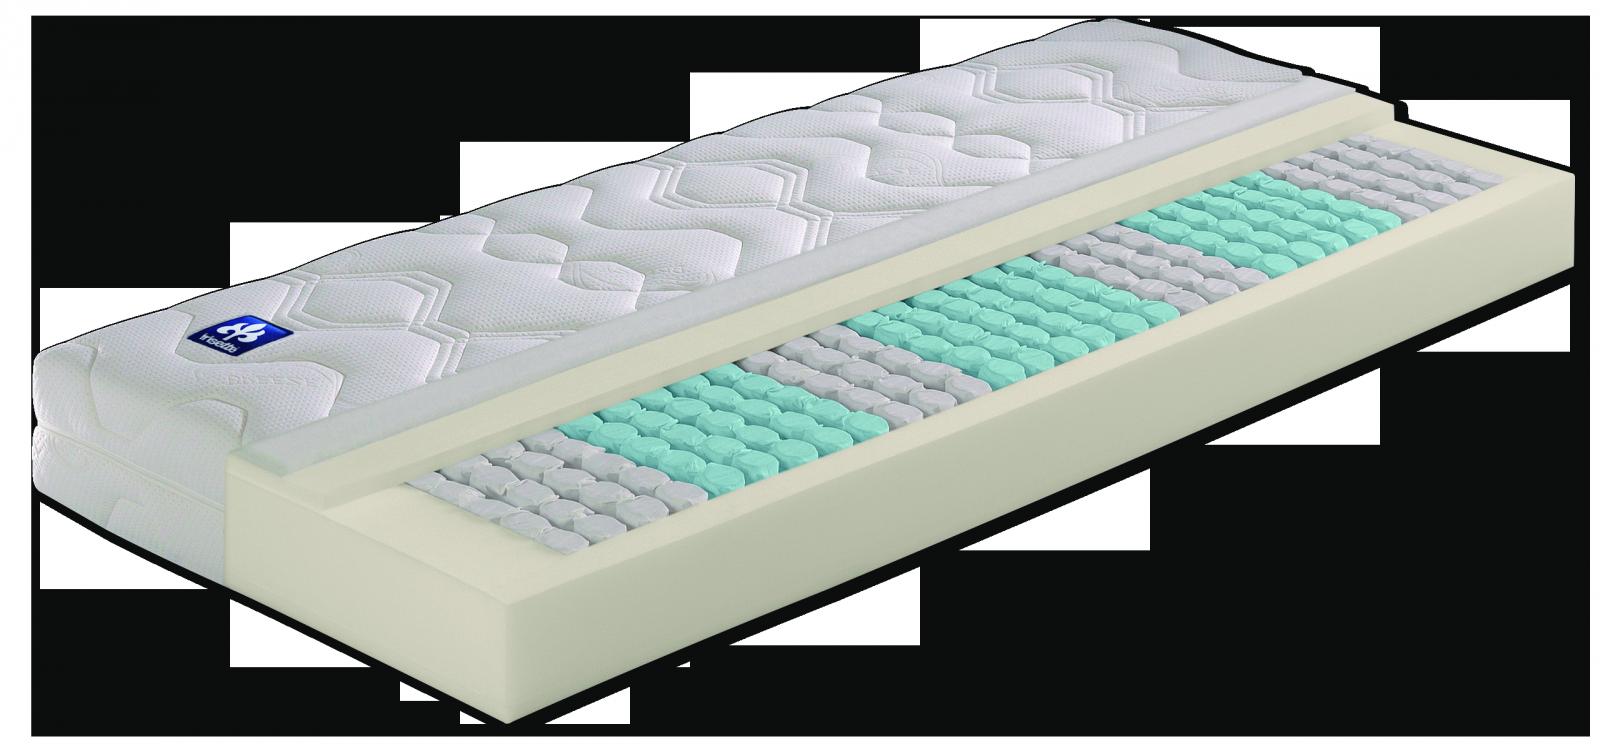 irisette lotus tfk tonnentaschenfederkern matratze badenia 140x200 cm h2 matratzen nach gr e. Black Bedroom Furniture Sets. Home Design Ideas